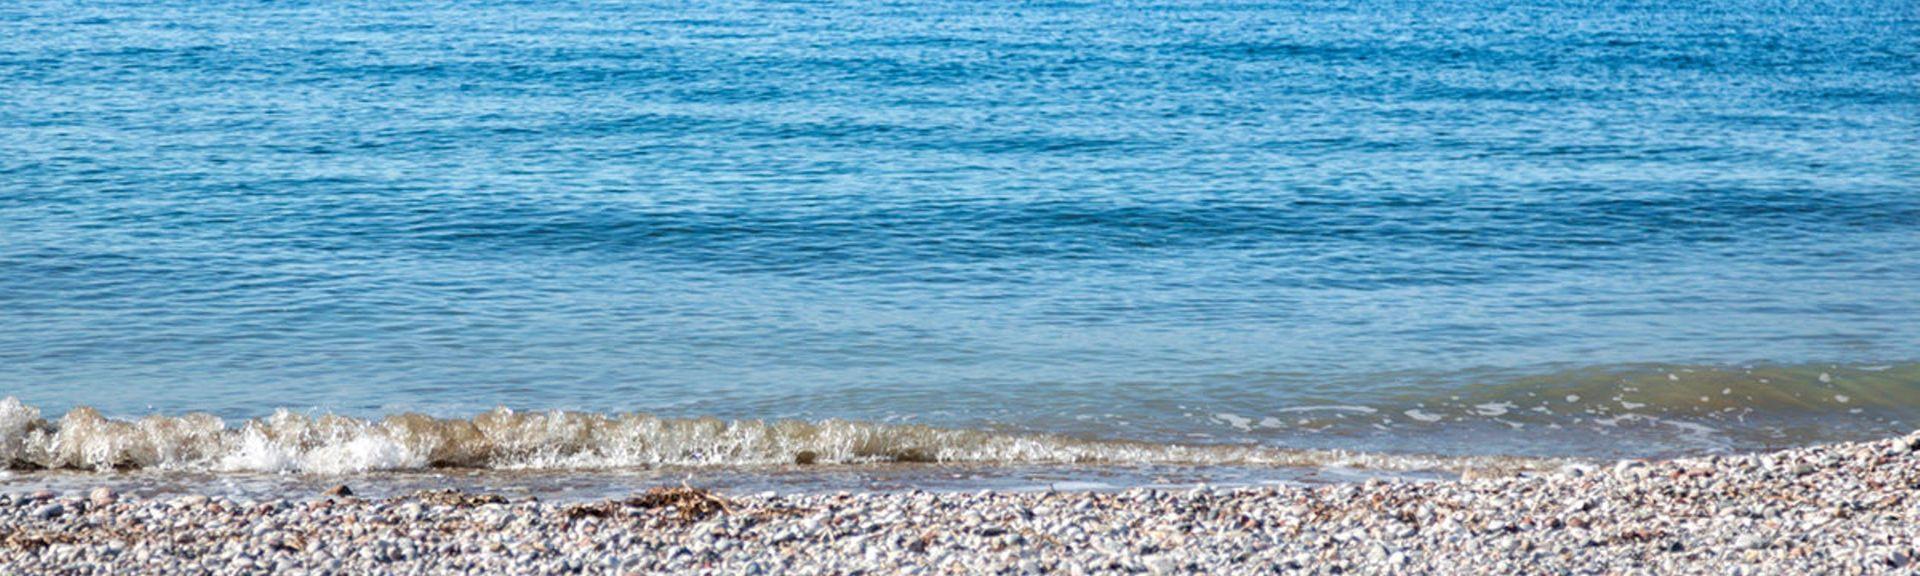 Faliraki, Egeiska öarna, Grekland